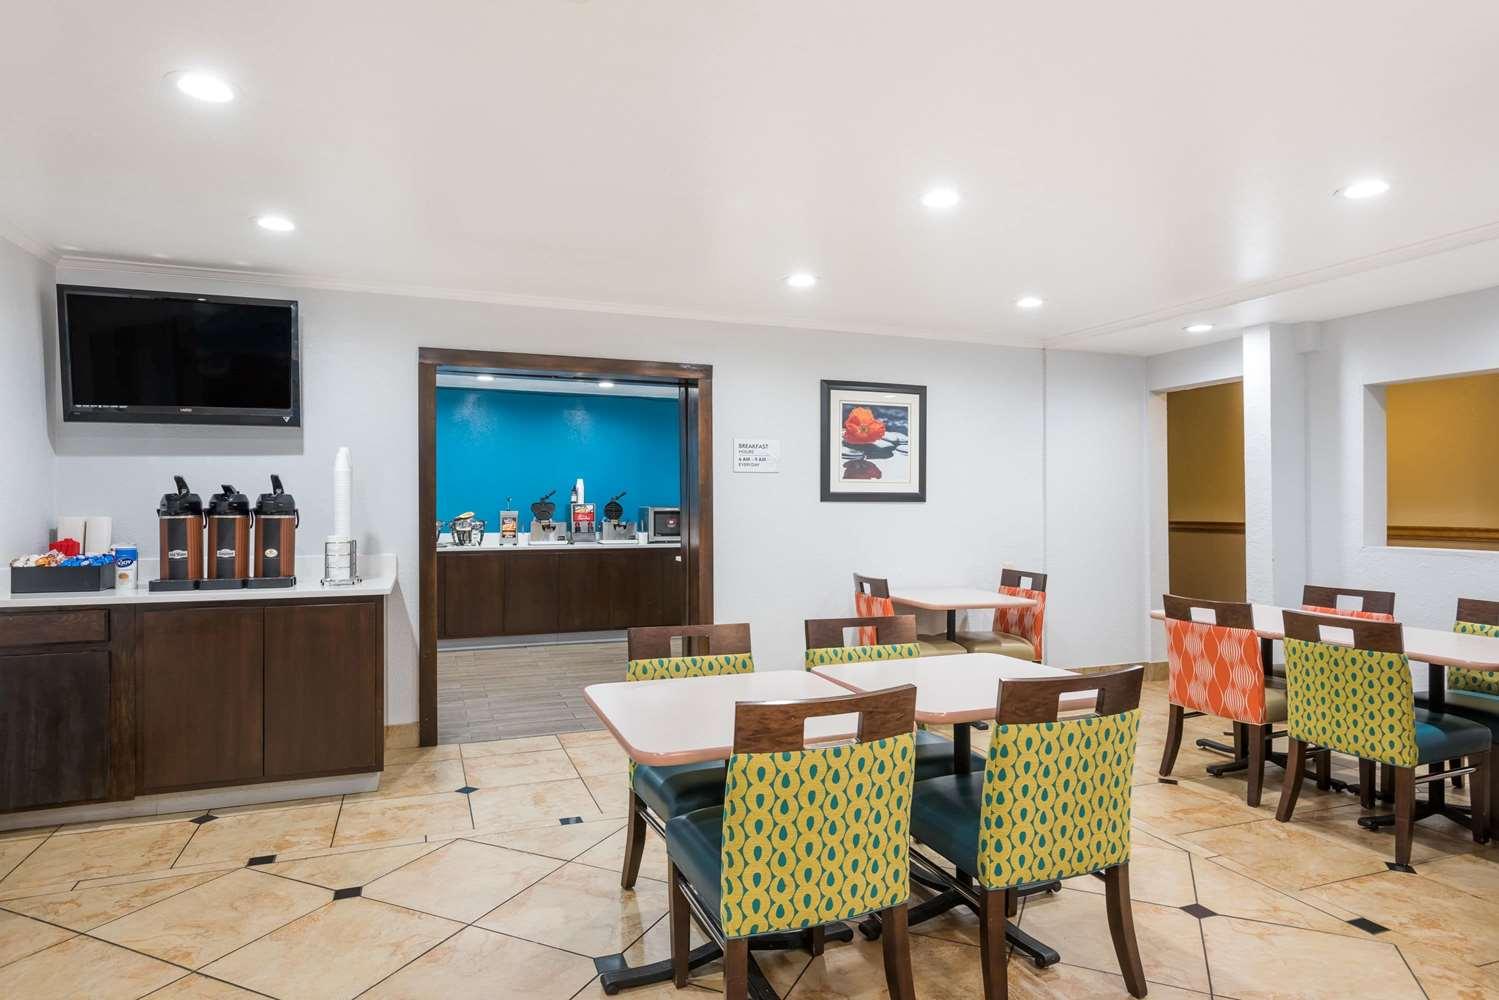 proam - Ramada Hotel Coeur d'Alene